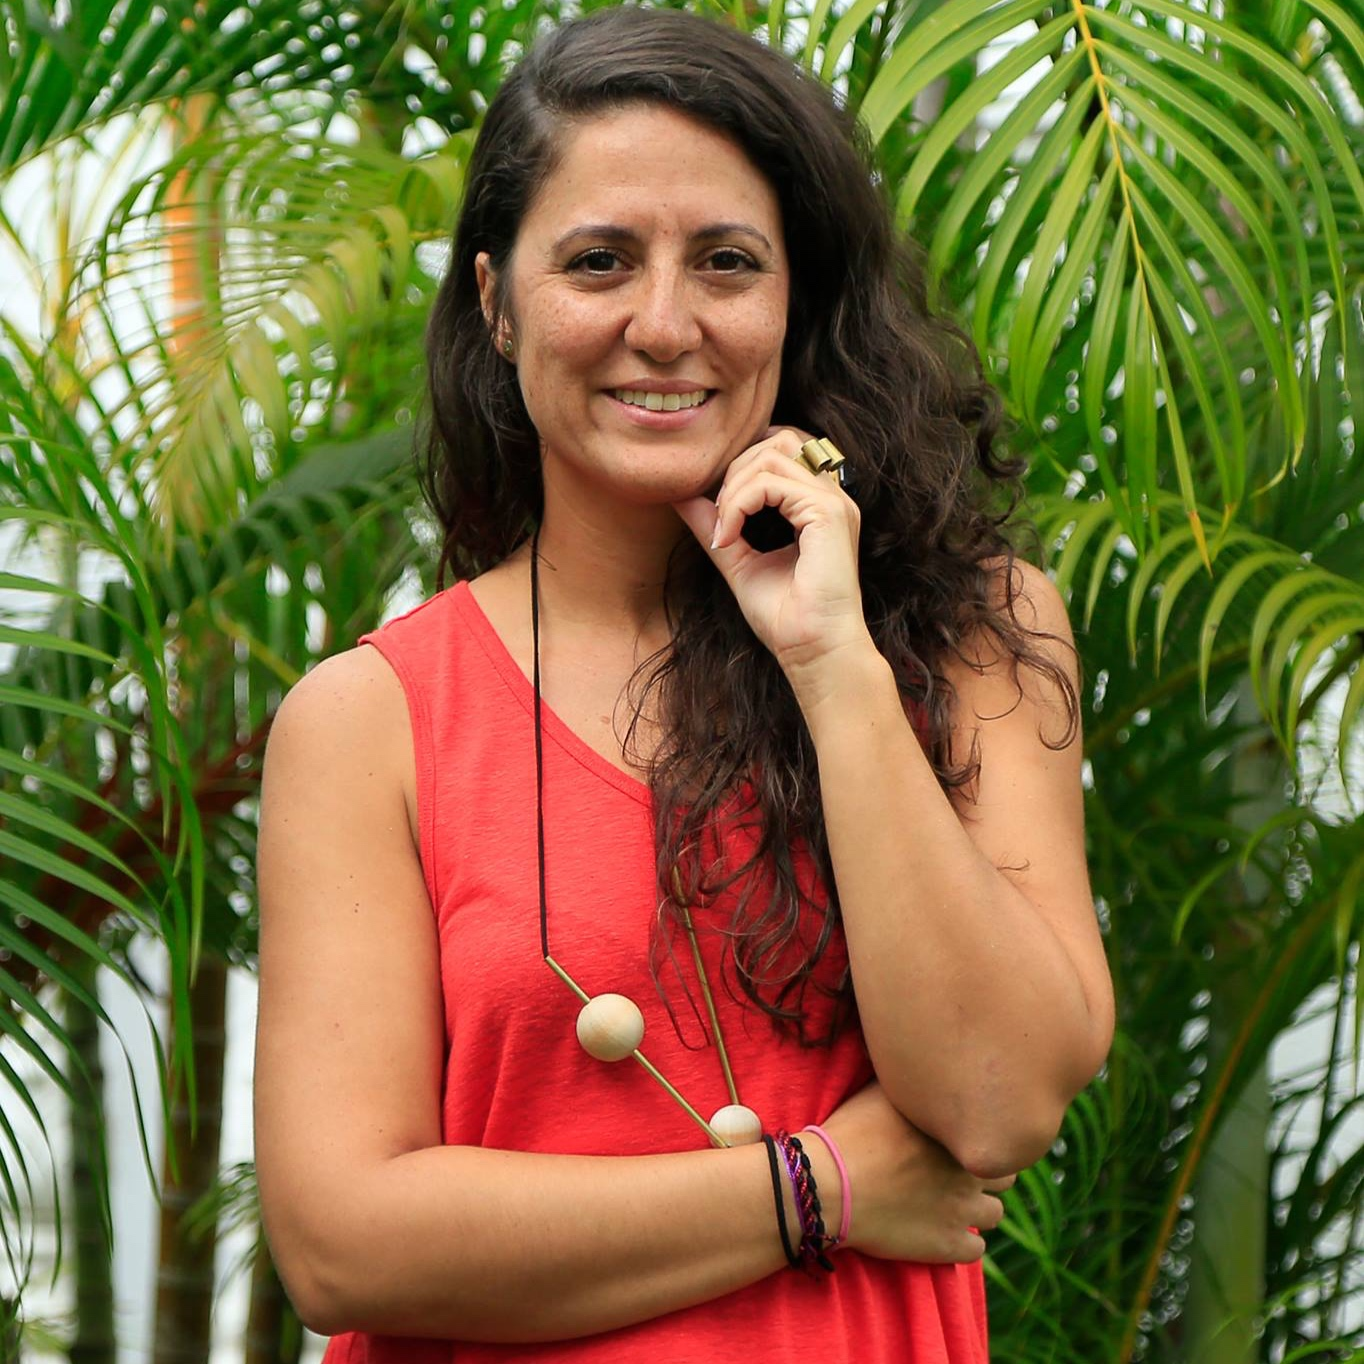 Mariela Fullana Acosta